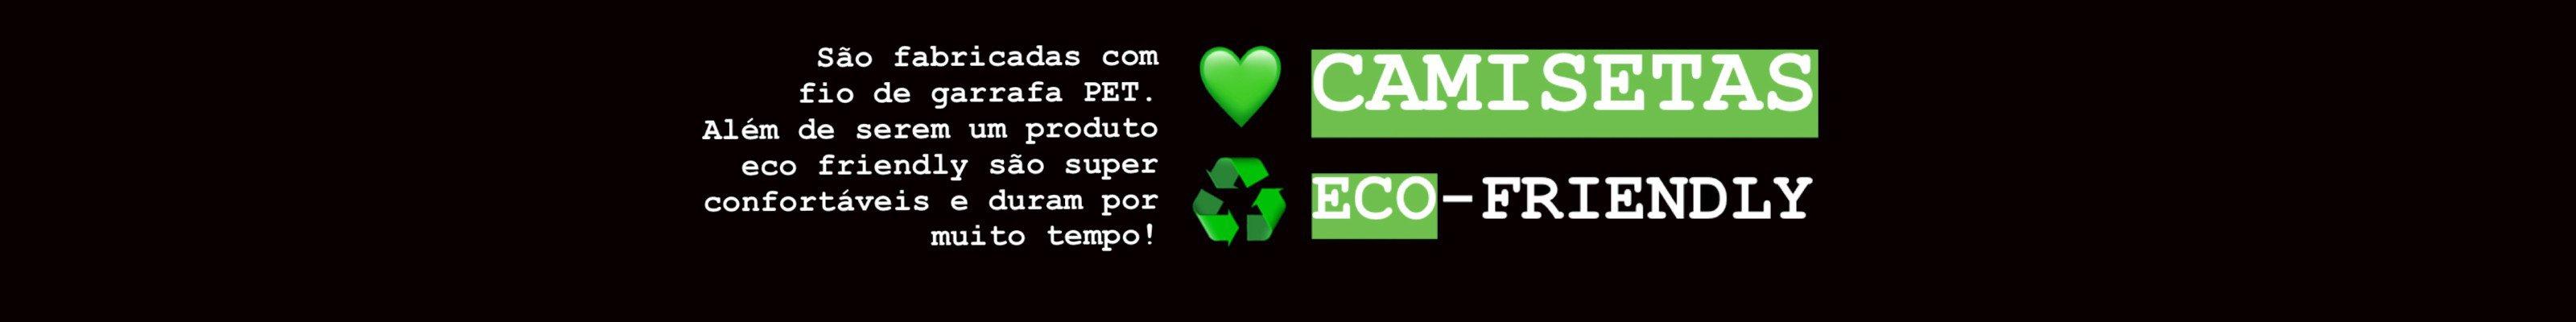 Banner Camistas Eco